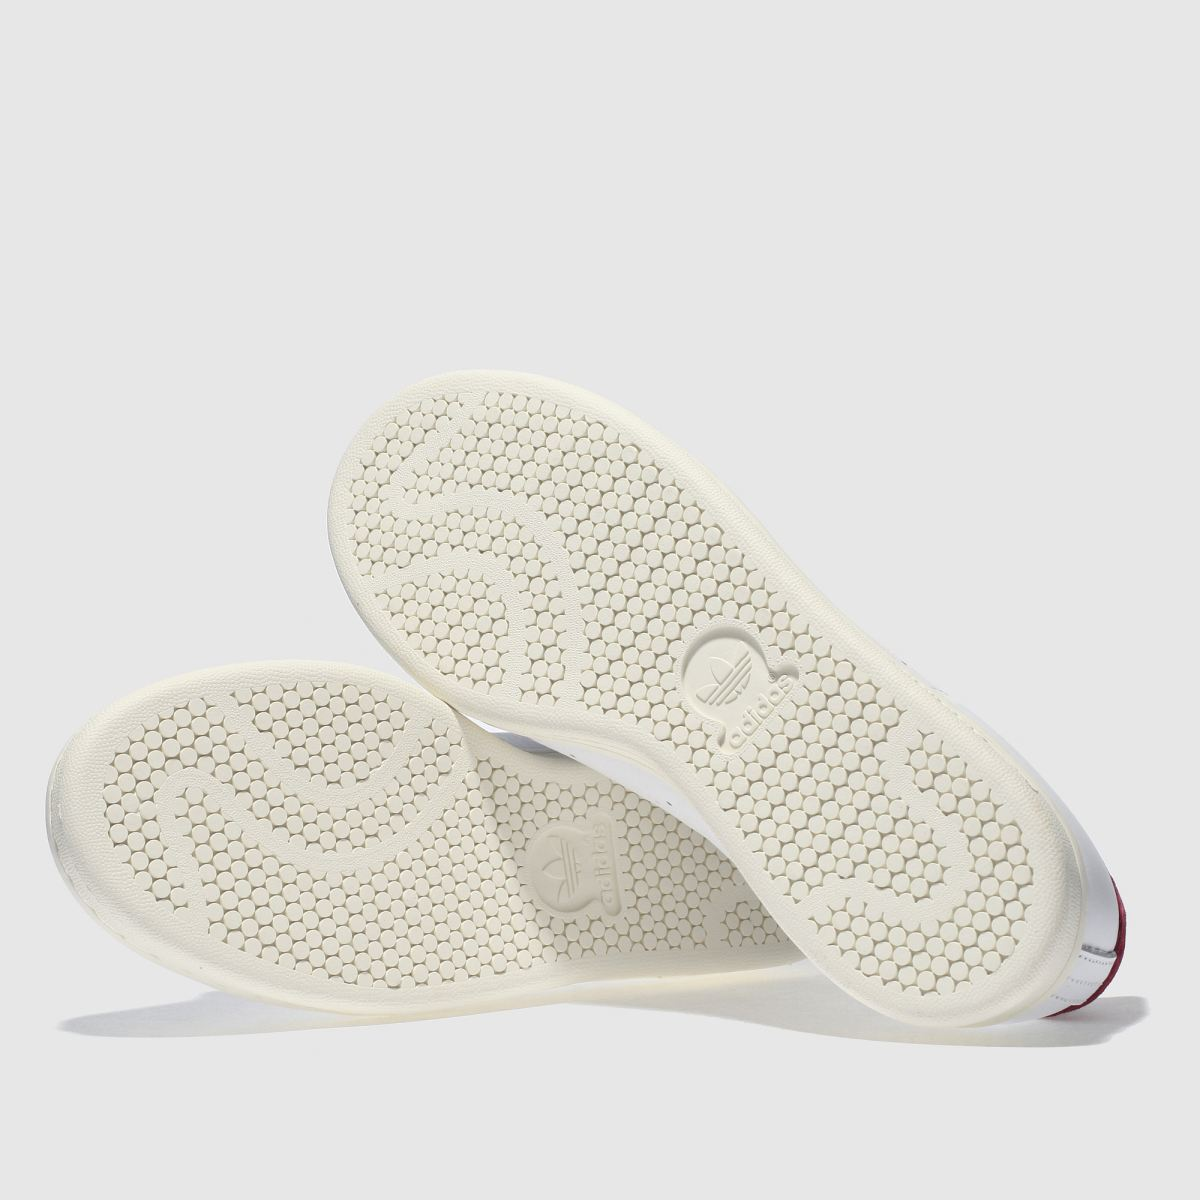 Damen Weiß-weinrot adidas Qualität Stan Smith Sneaker | schuh Gute Qualität adidas beliebte Schuhe c54e41